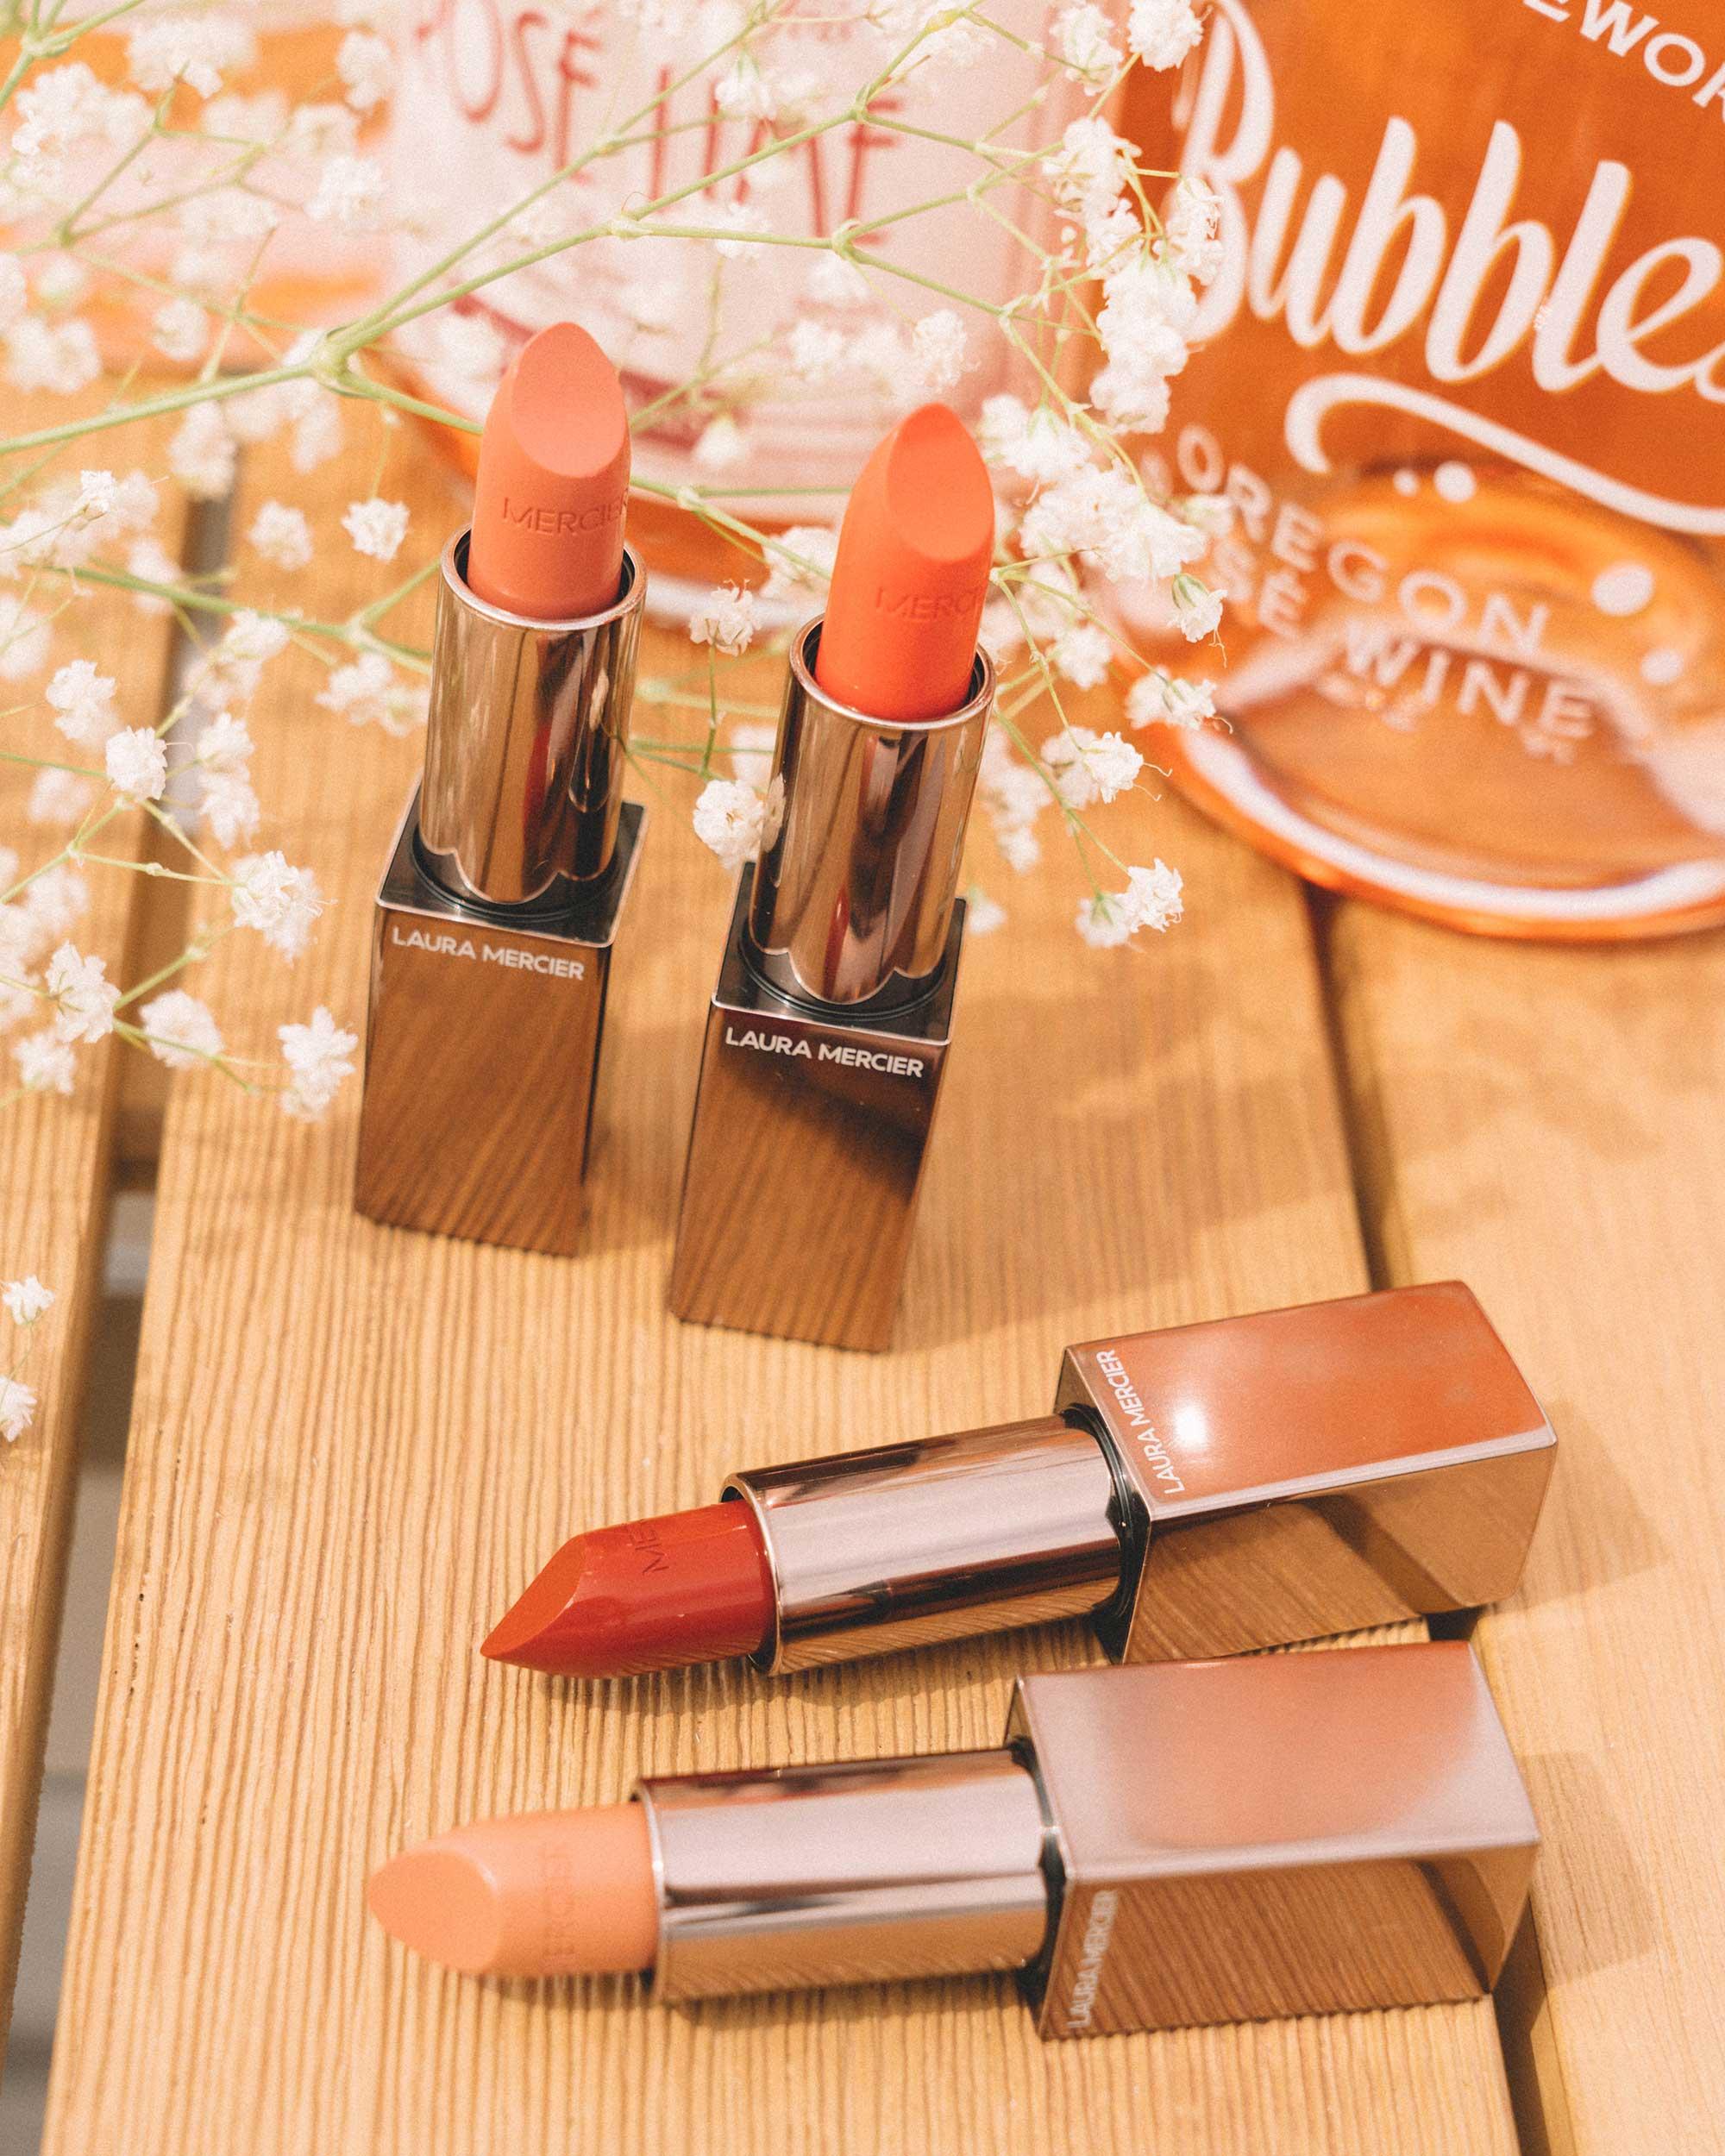 Laura-Mercier-Rouge-Essential-Silky-Creme-Lipstick1.jpg